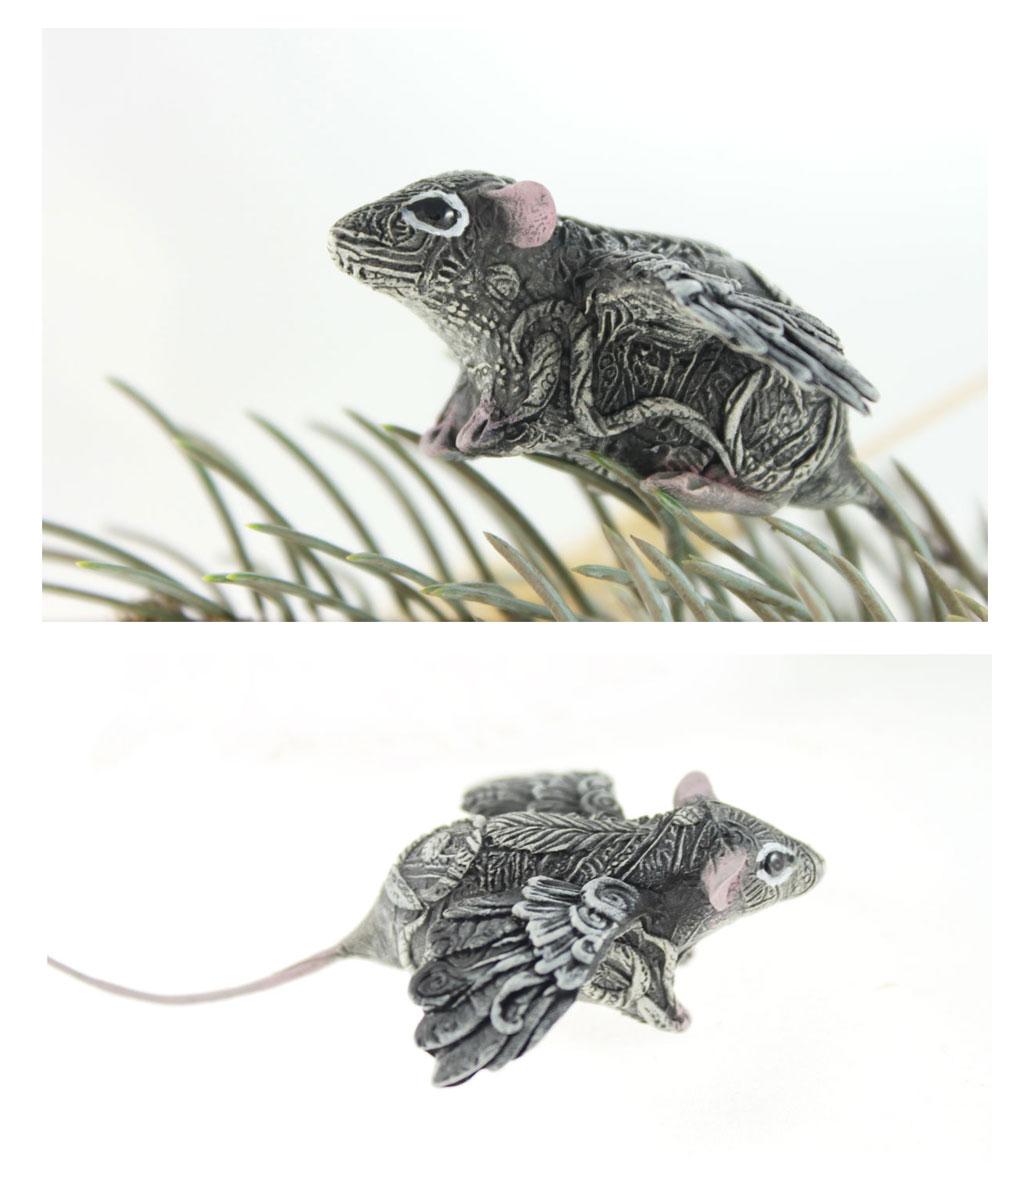 Tiny dumbo rat by hontor